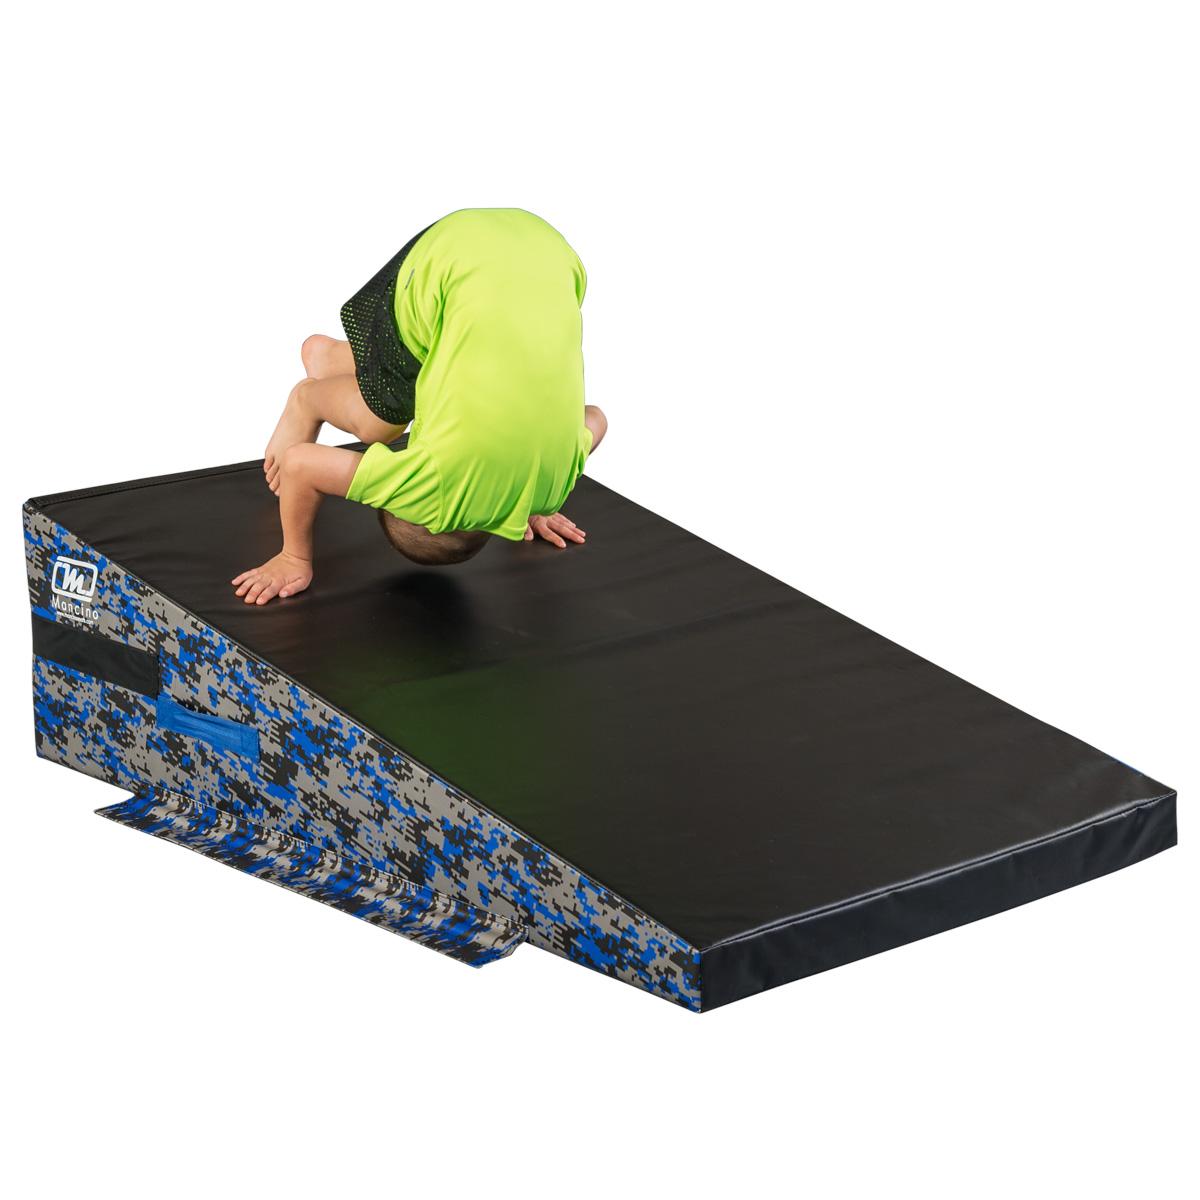 ninja warrior course incline wedge mat - Mancino Mats